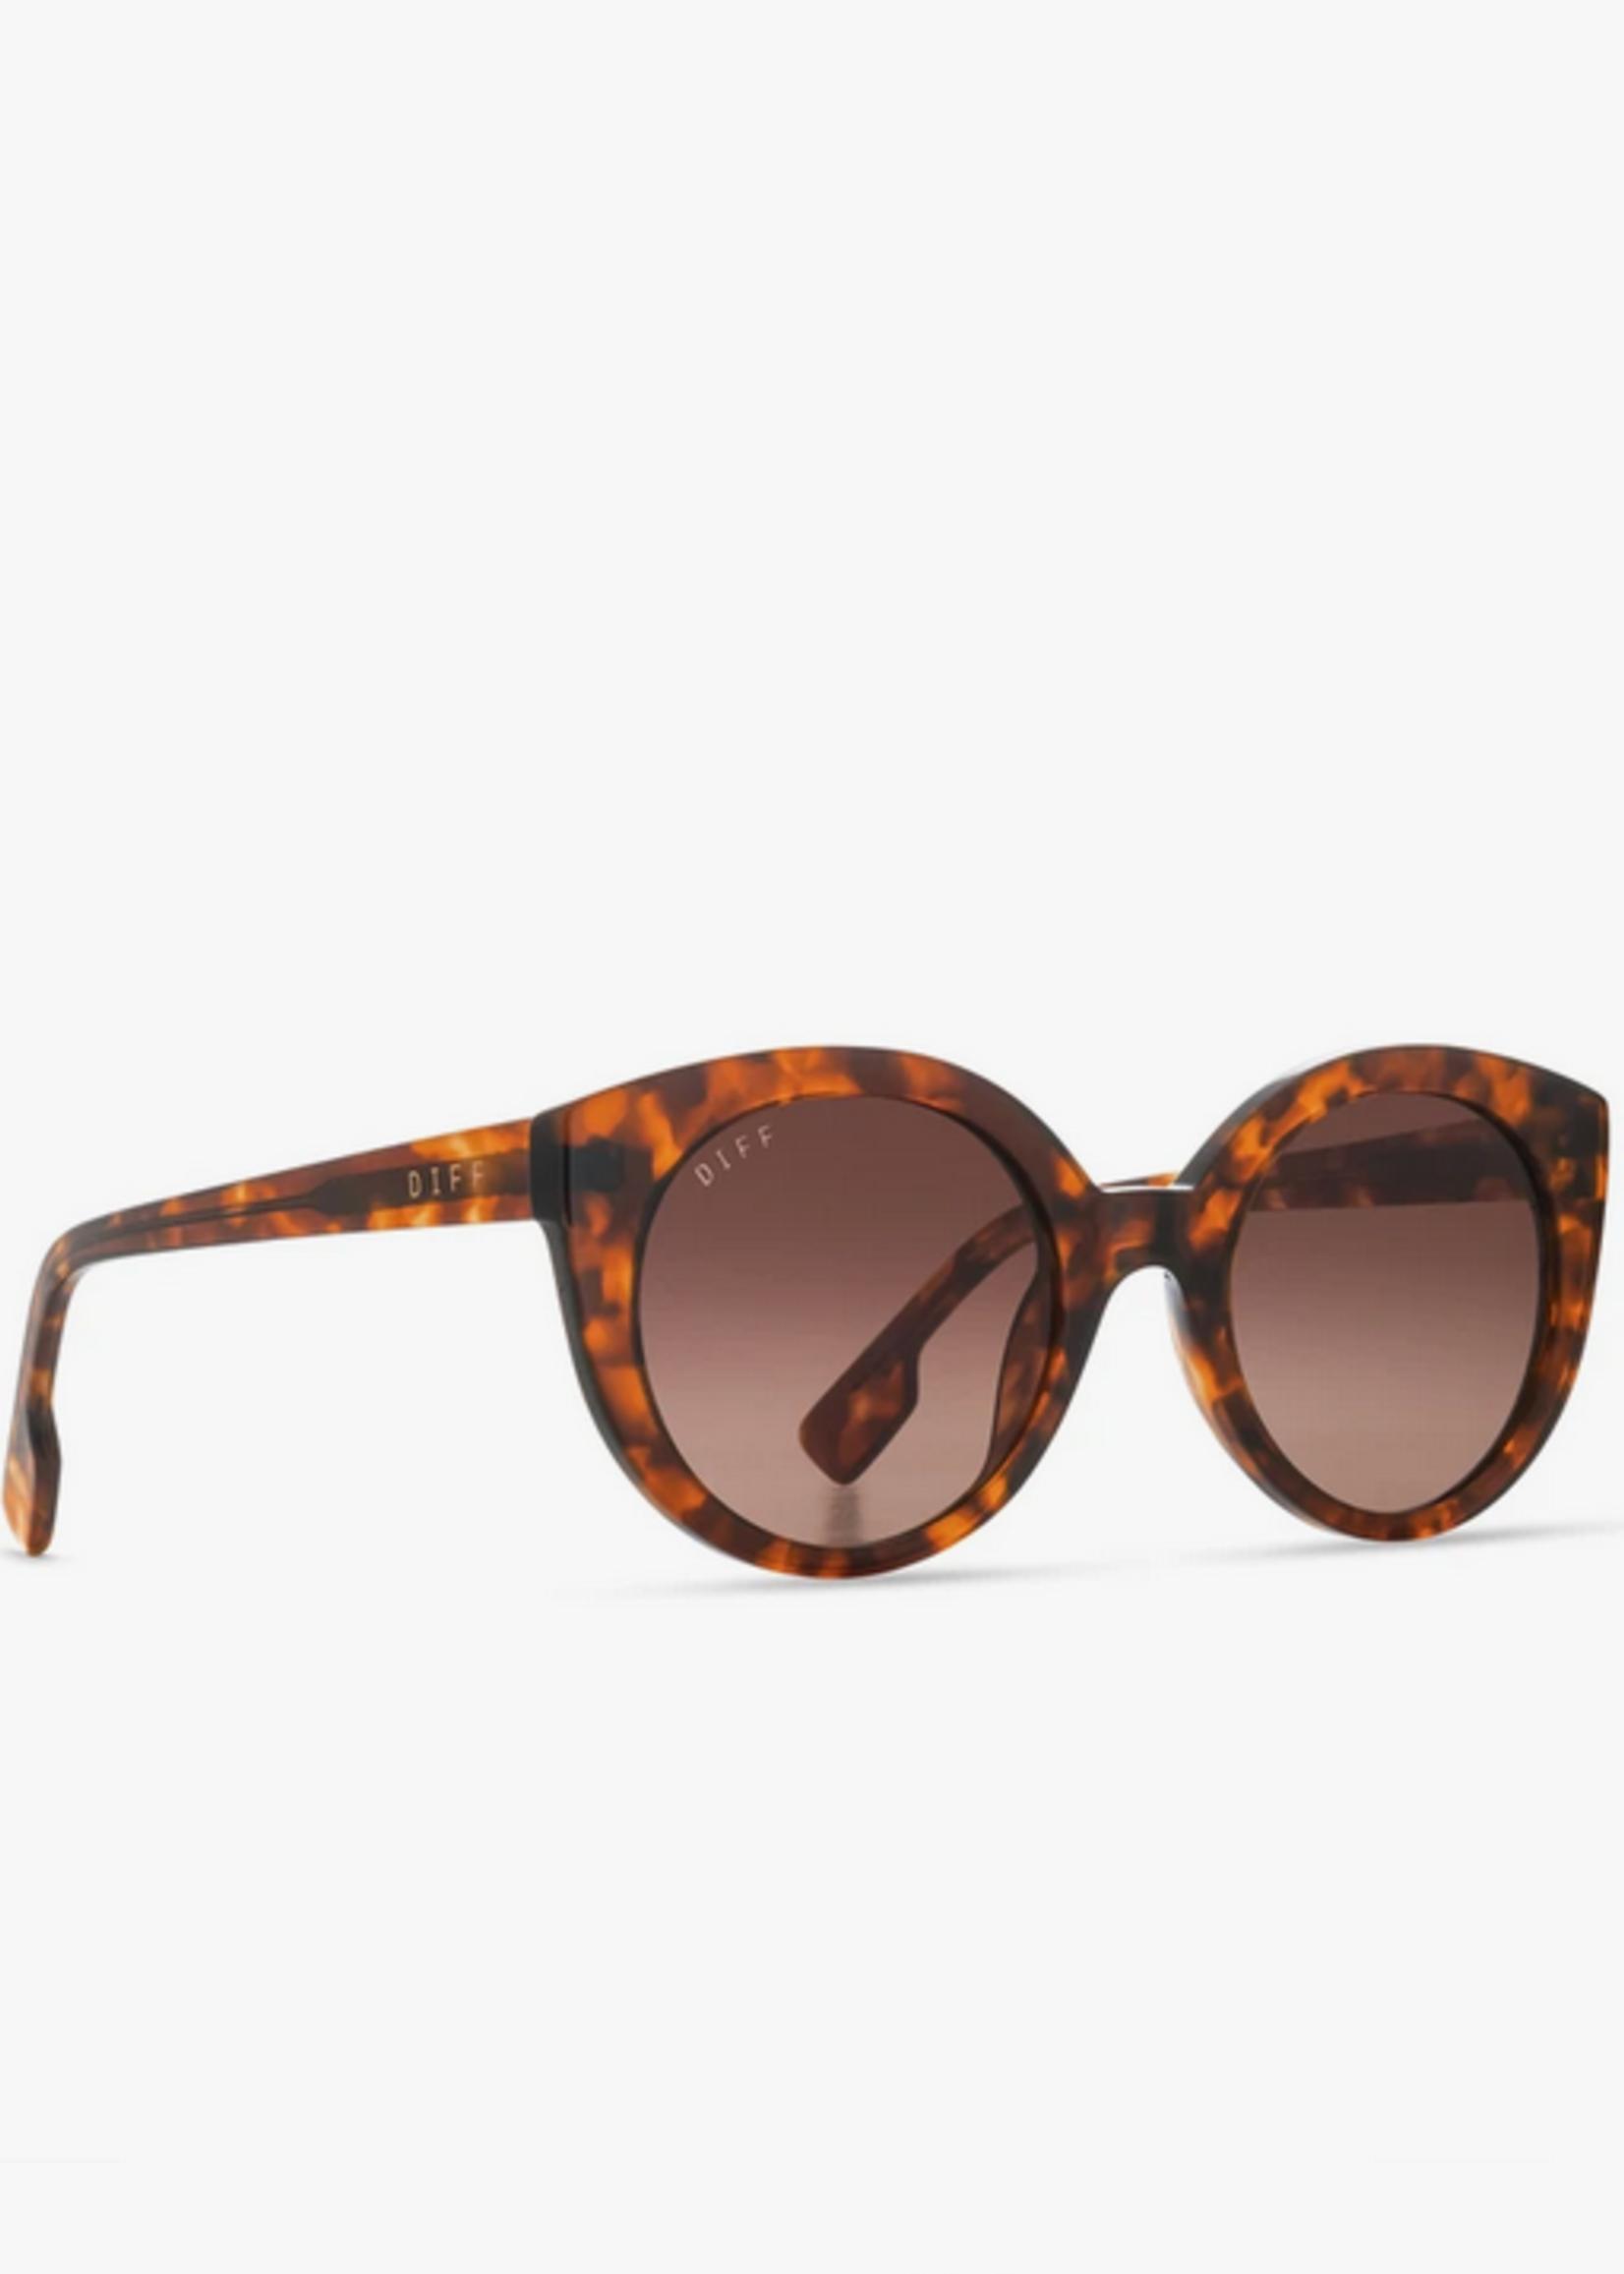 Elitaire Boutique The Emmy Amber Tortoise Polarized Sunglasses